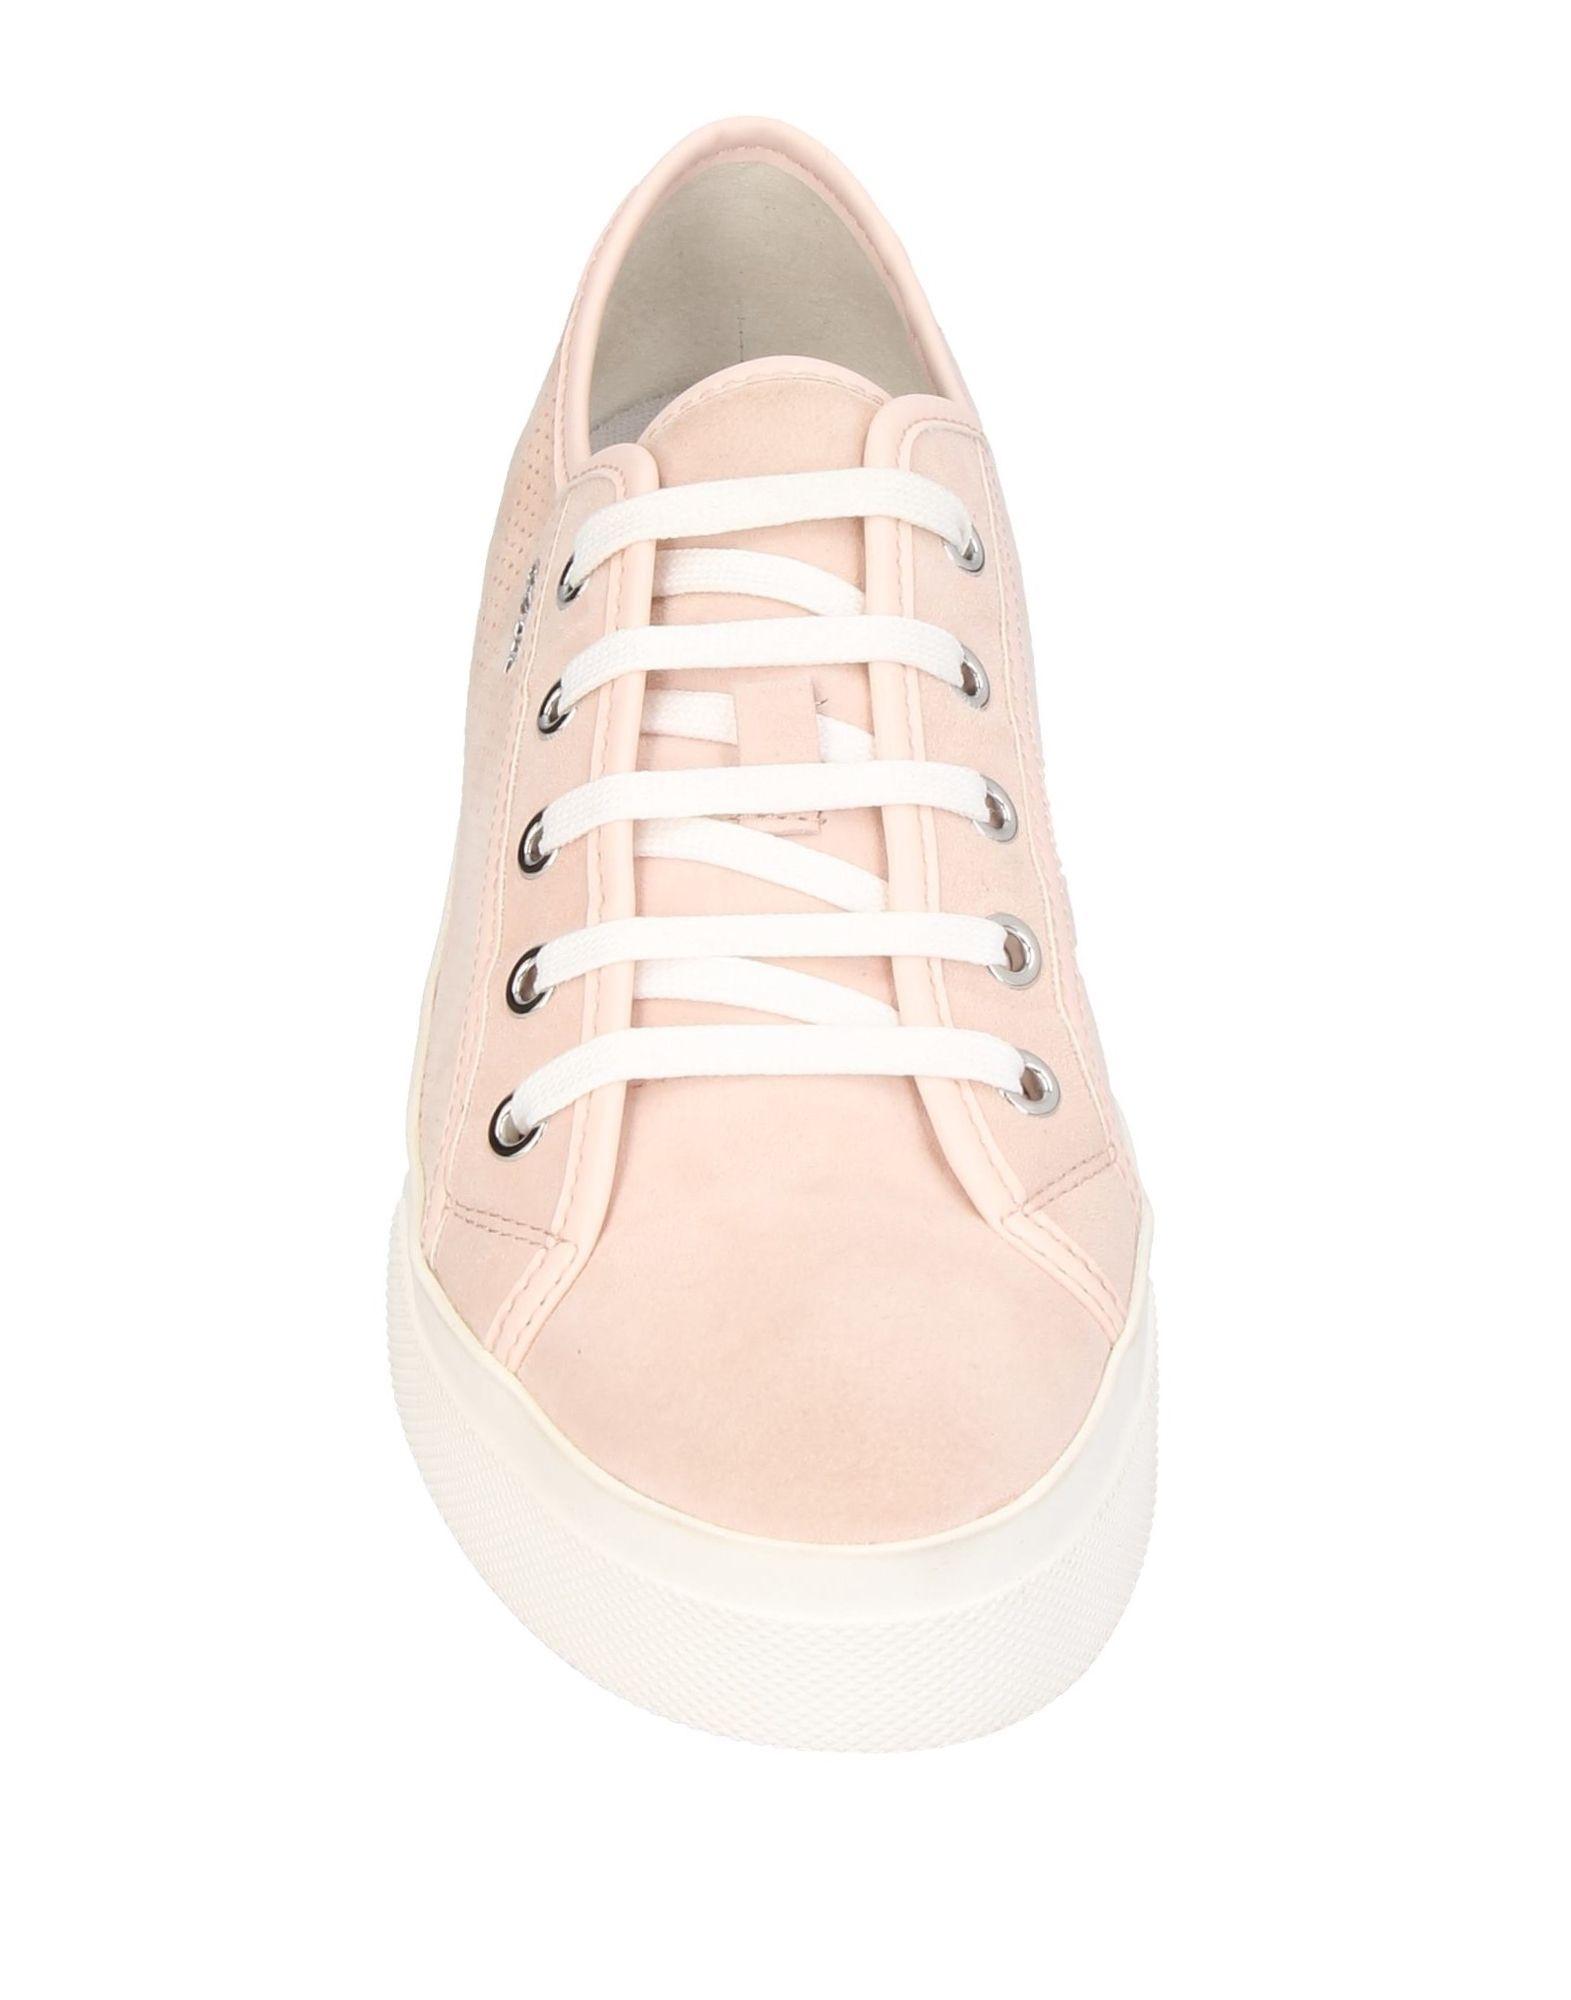 Geox Sneakers Sneakers Geox Damen  11414186CA Gute Qualität beliebte Schuhe b3121f